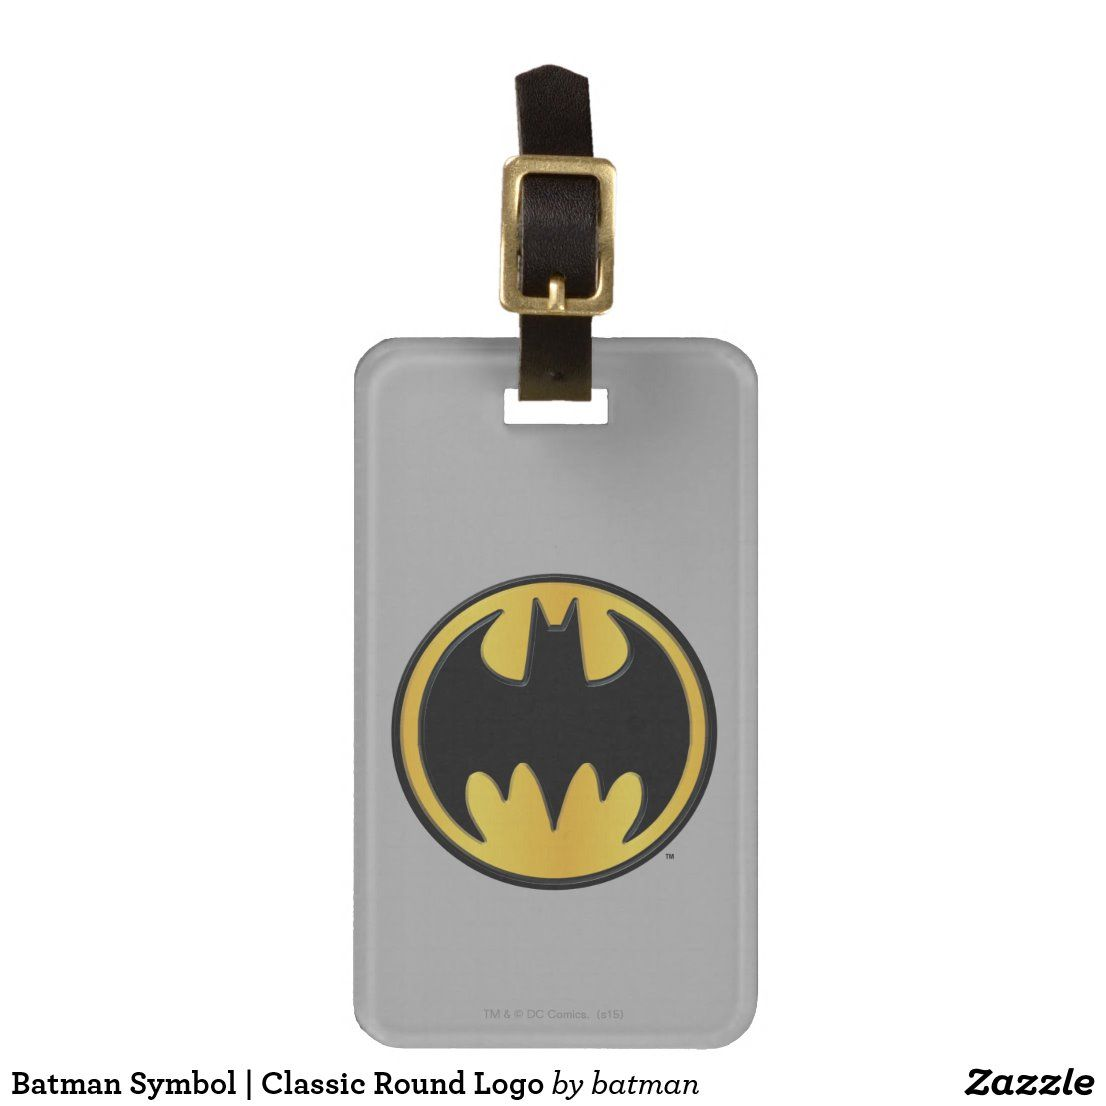 Batman symbol classic round logo luggage tag zazzle